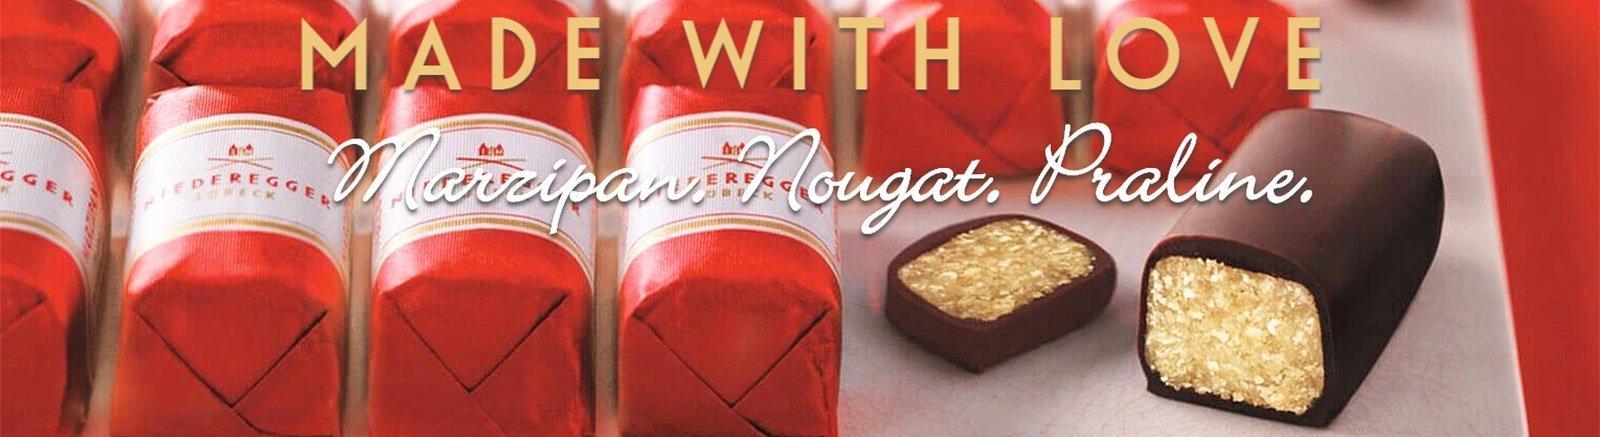 Niederegger German Marzipan Chocolates